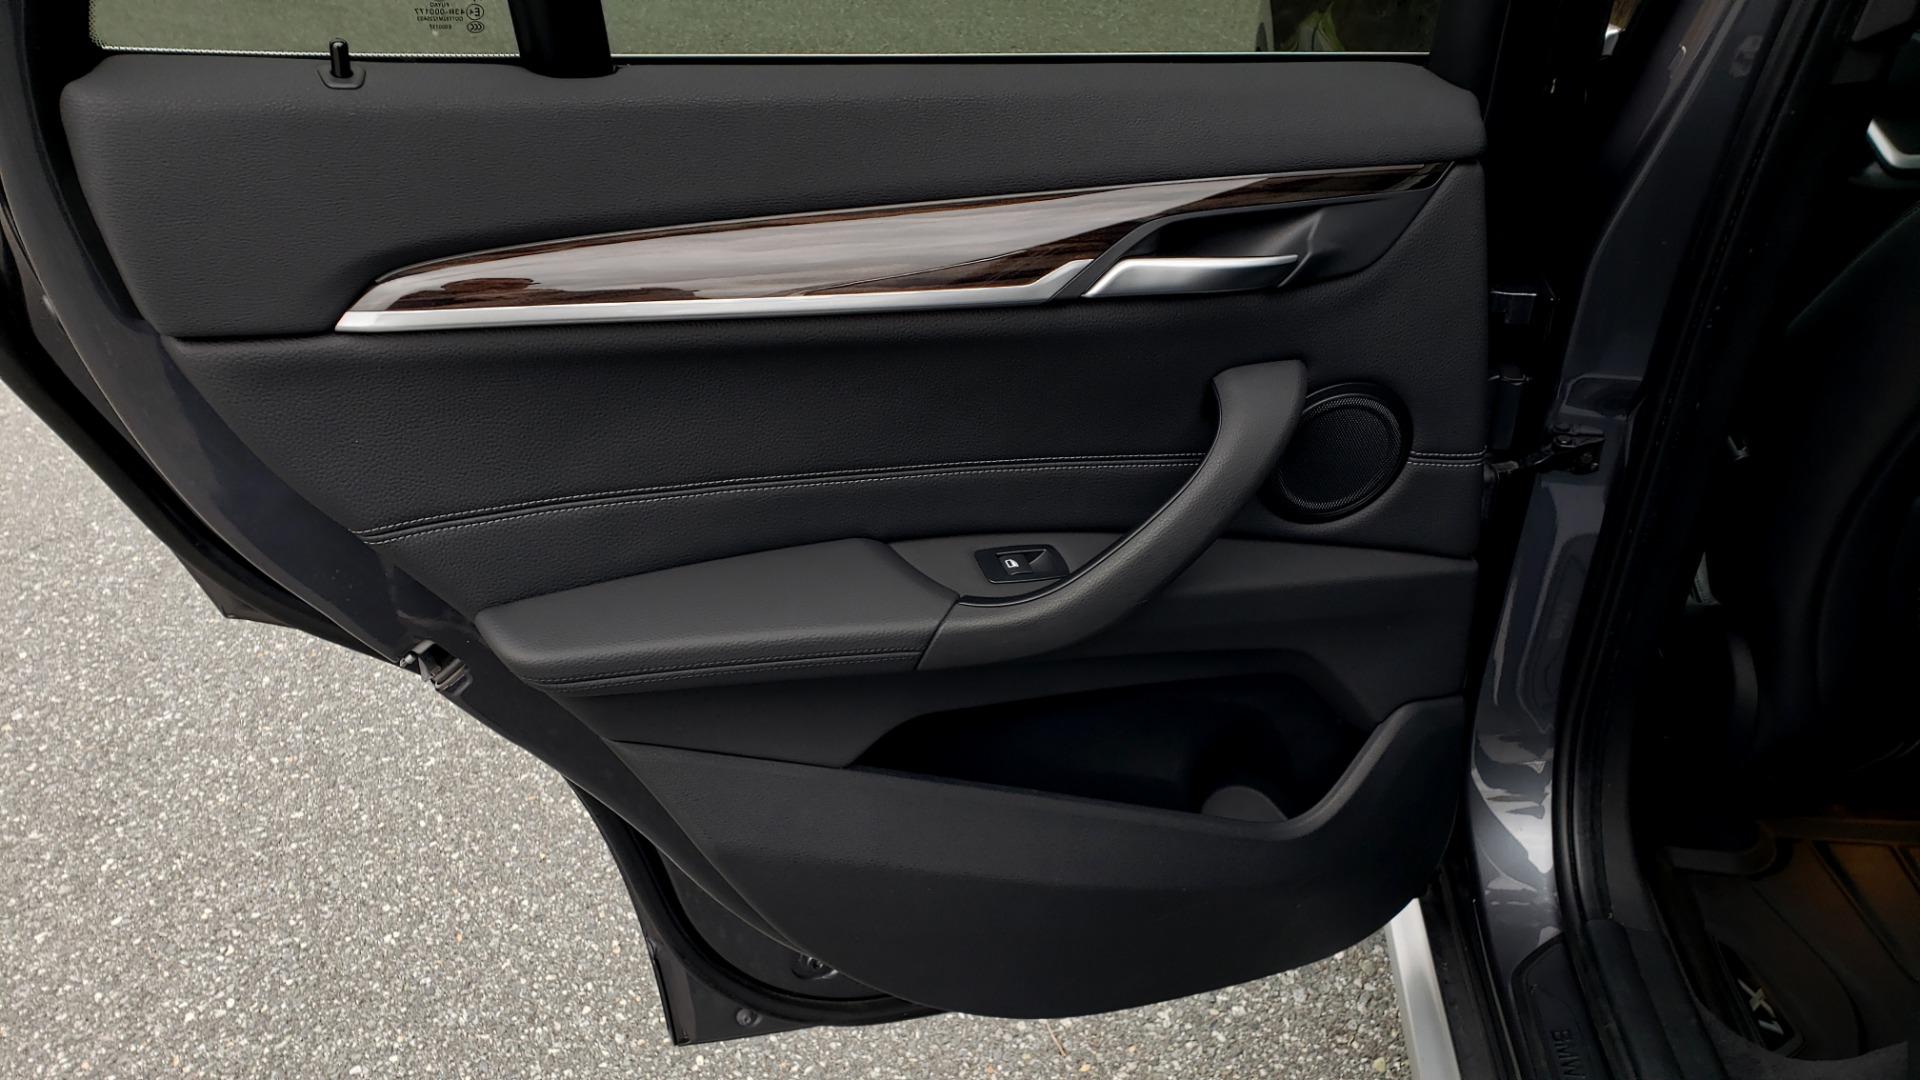 Used 2017 BMW X1 XDRIVE28I / PREM PKG / DRIVER ASST / NAV / CLD WTHR for sale Sold at Formula Imports in Charlotte NC 28227 61